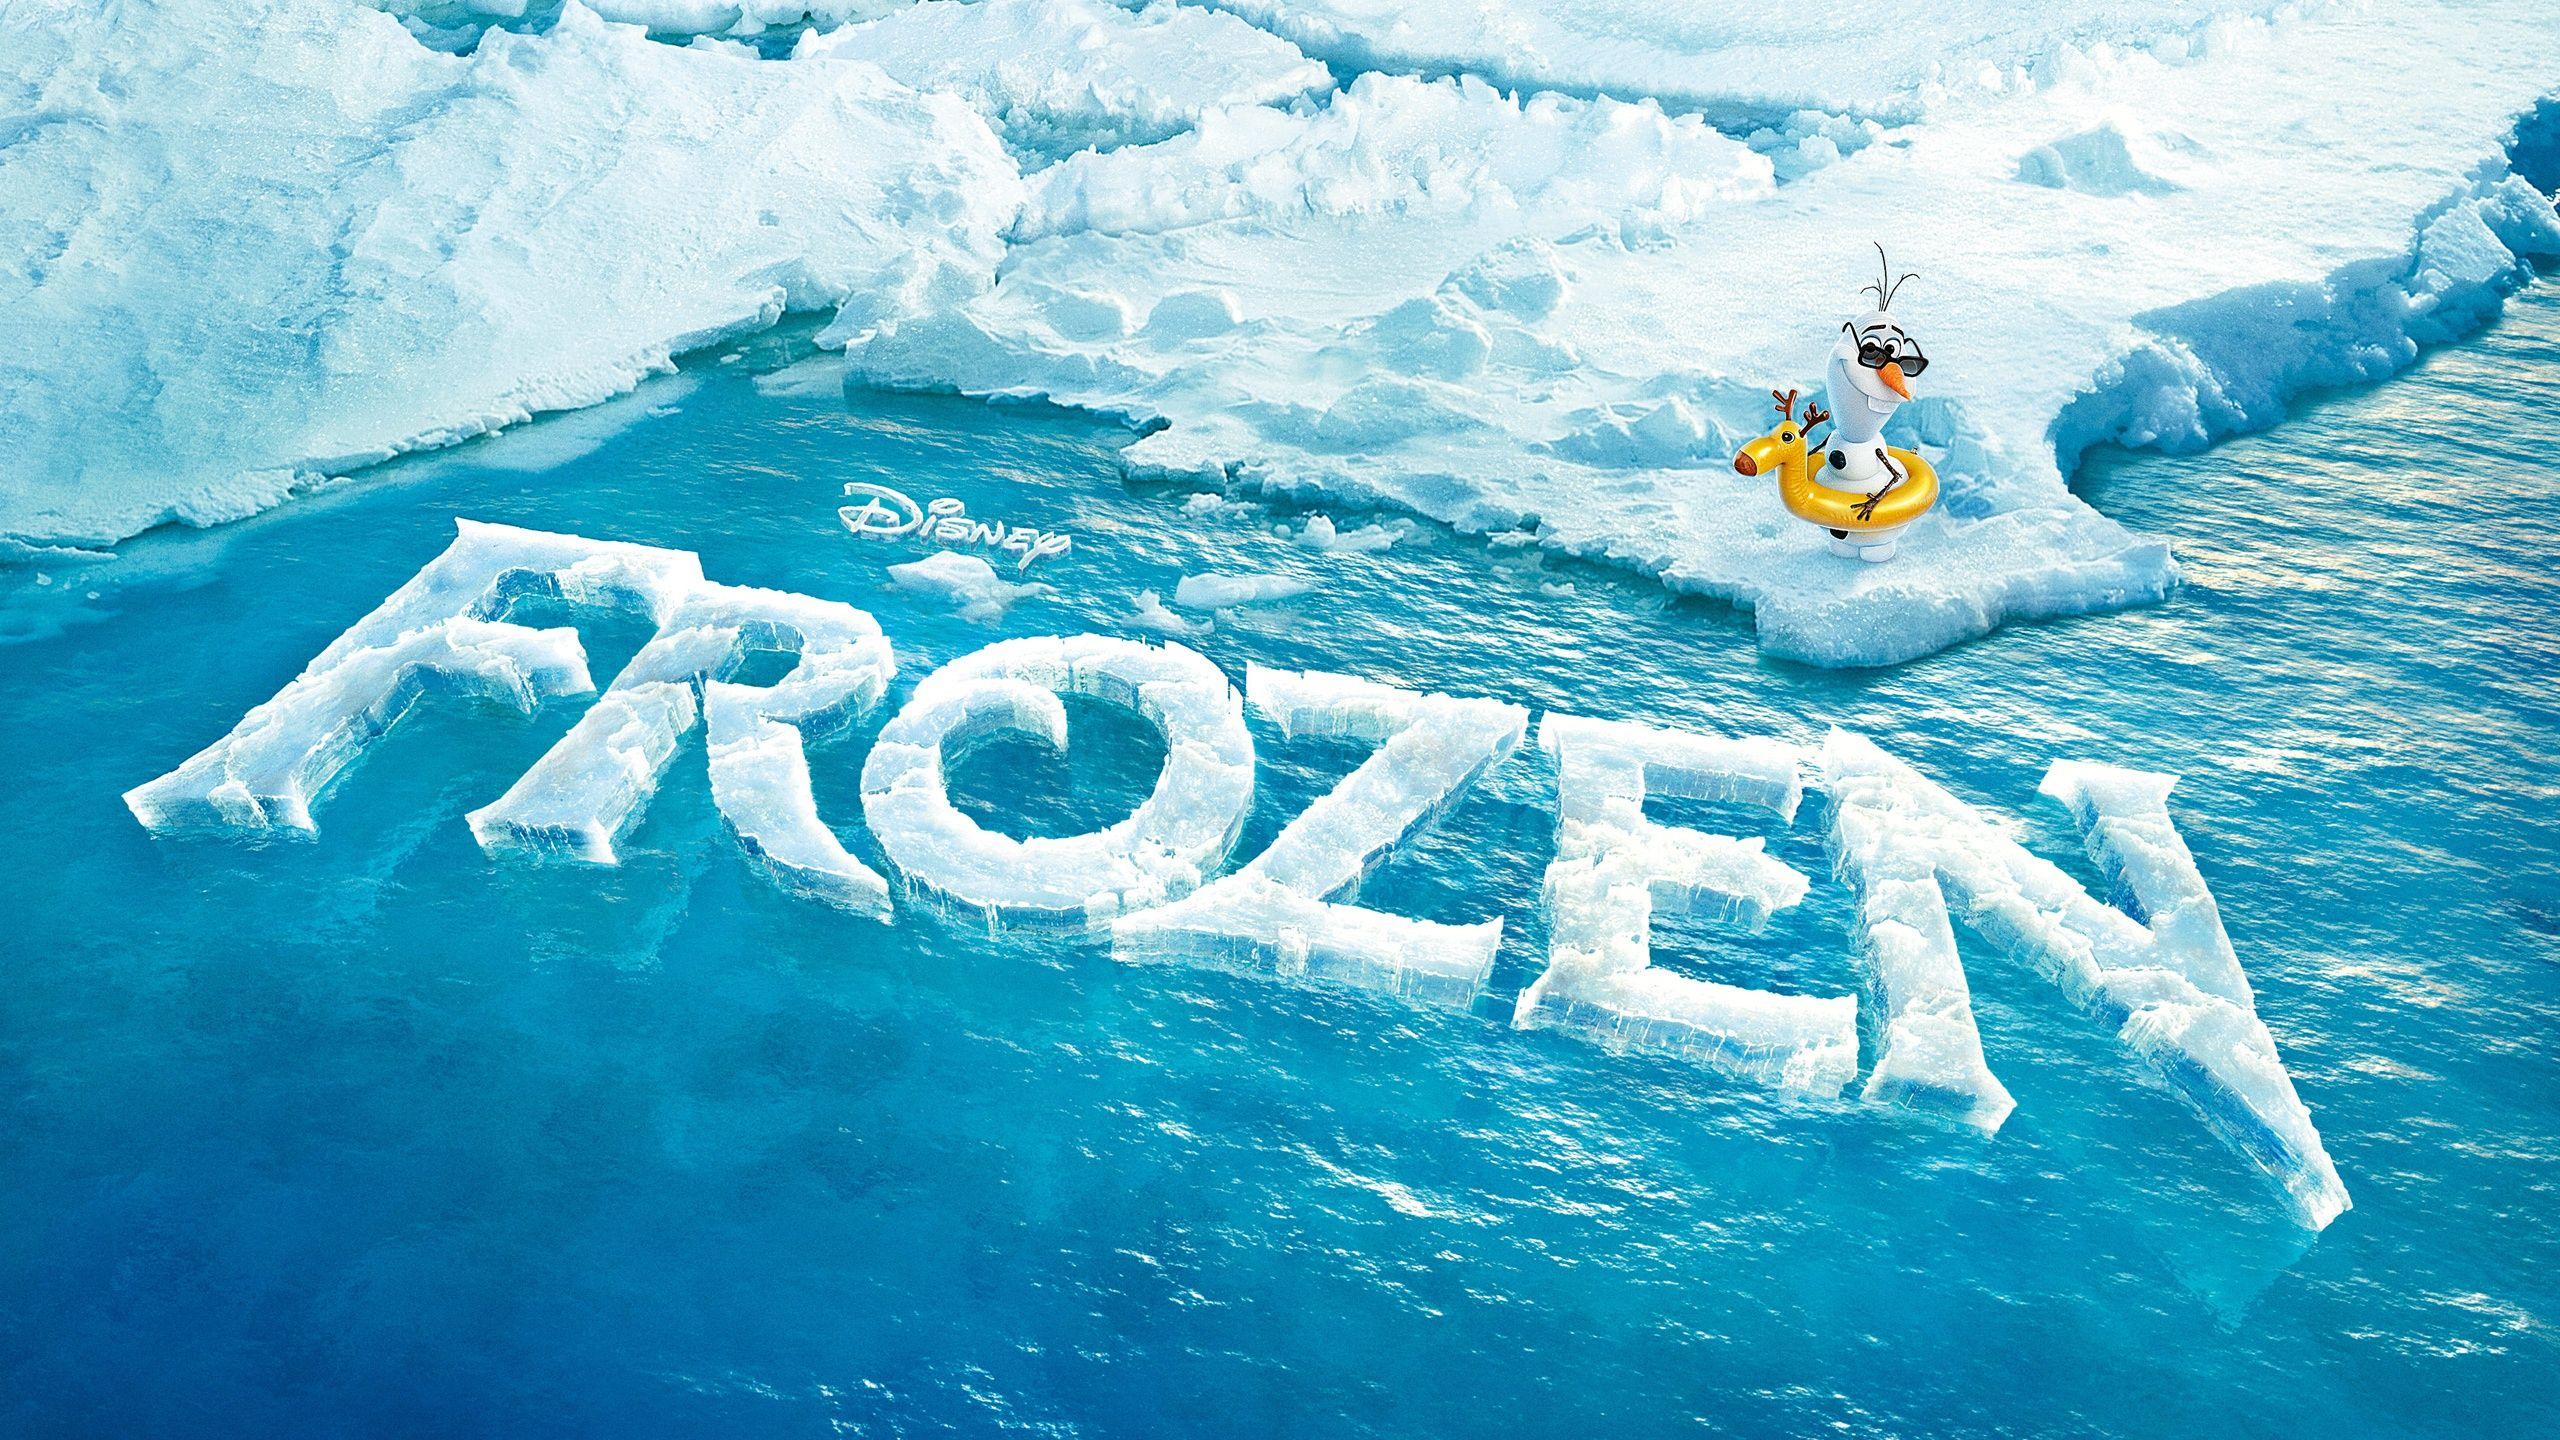 Frozen Movie HD Wallpapers for Your Desktop   Download 2560x1440